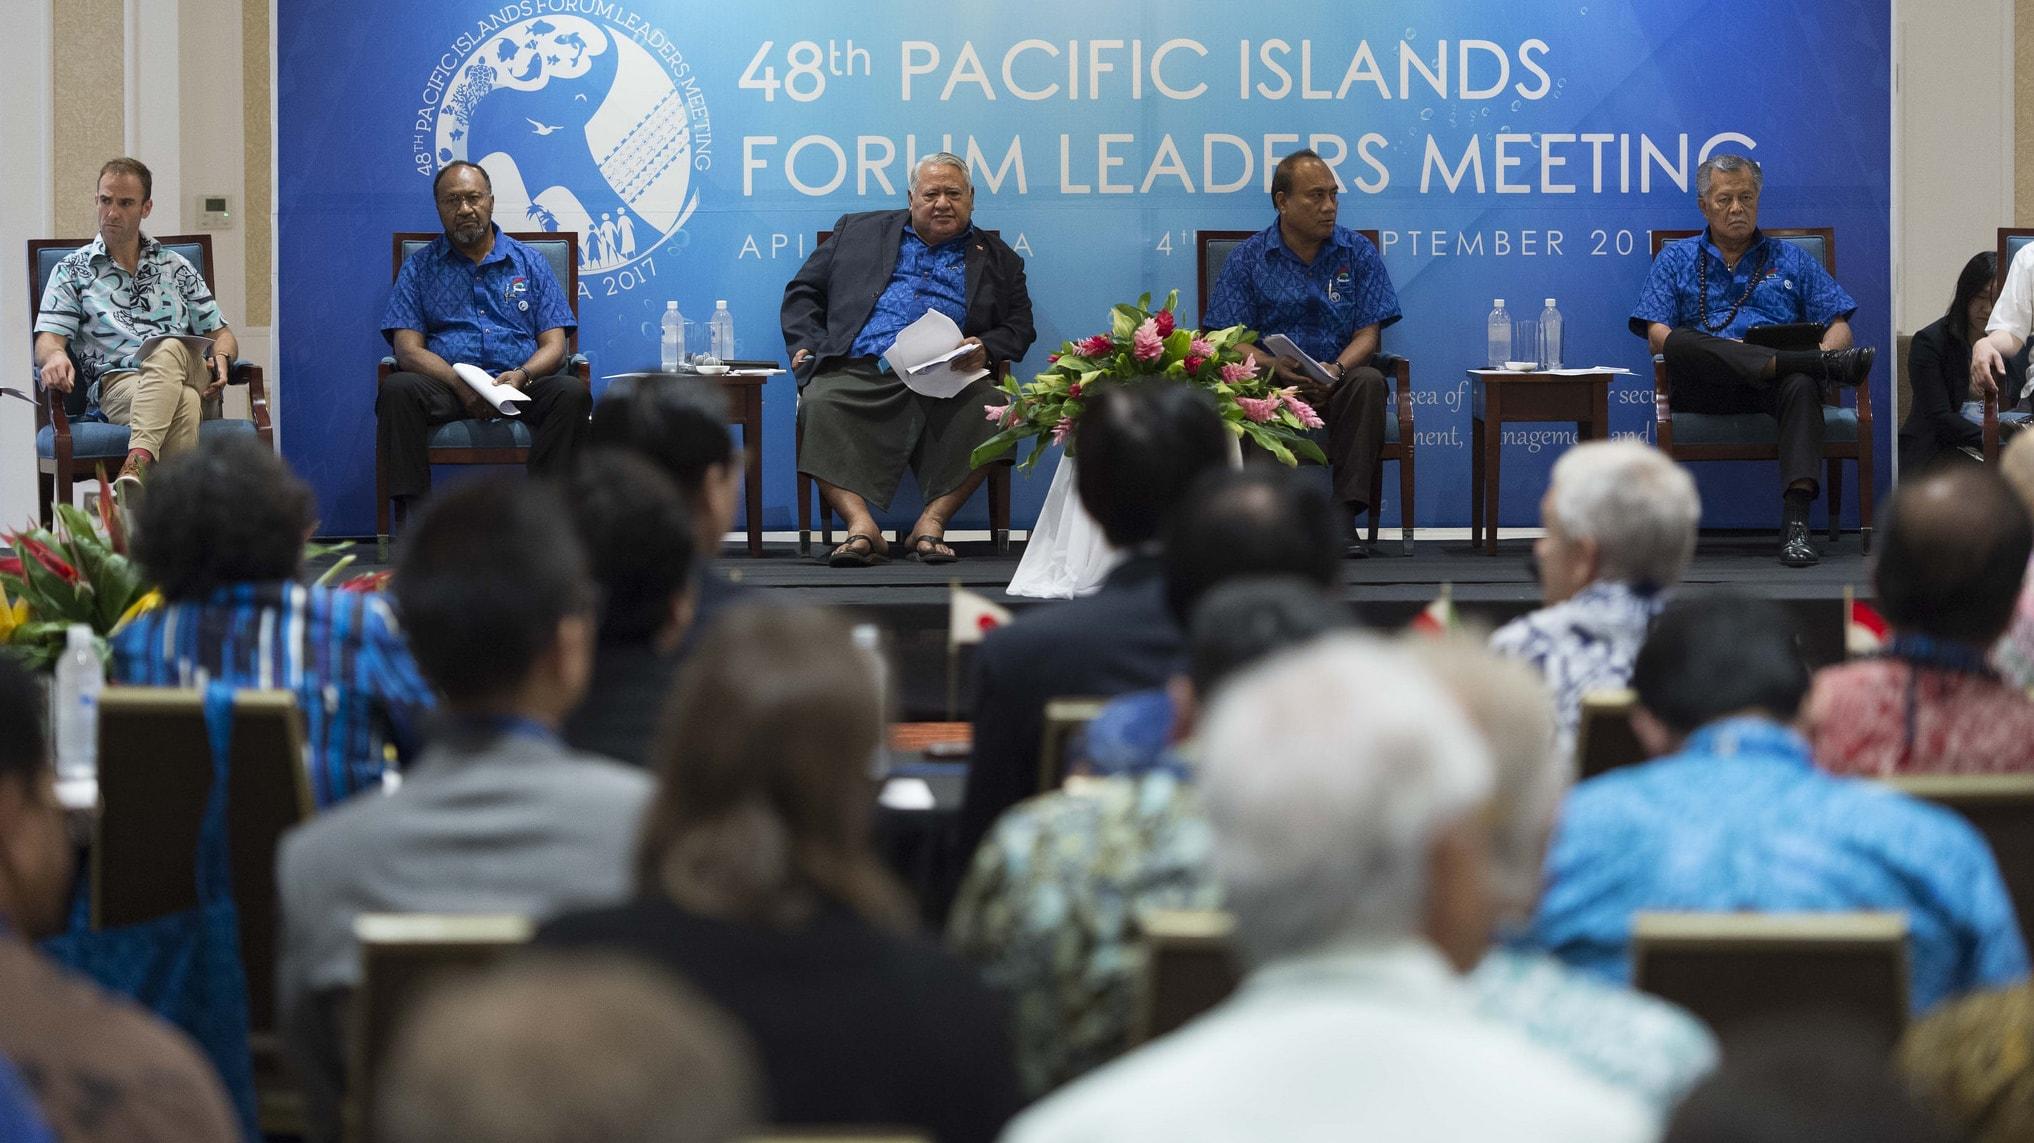 Opening the 2017 Pacific Island Forum Leaders Meeting, Apia, Samoa (Photo: US Embassy, Wellington/Flickr)